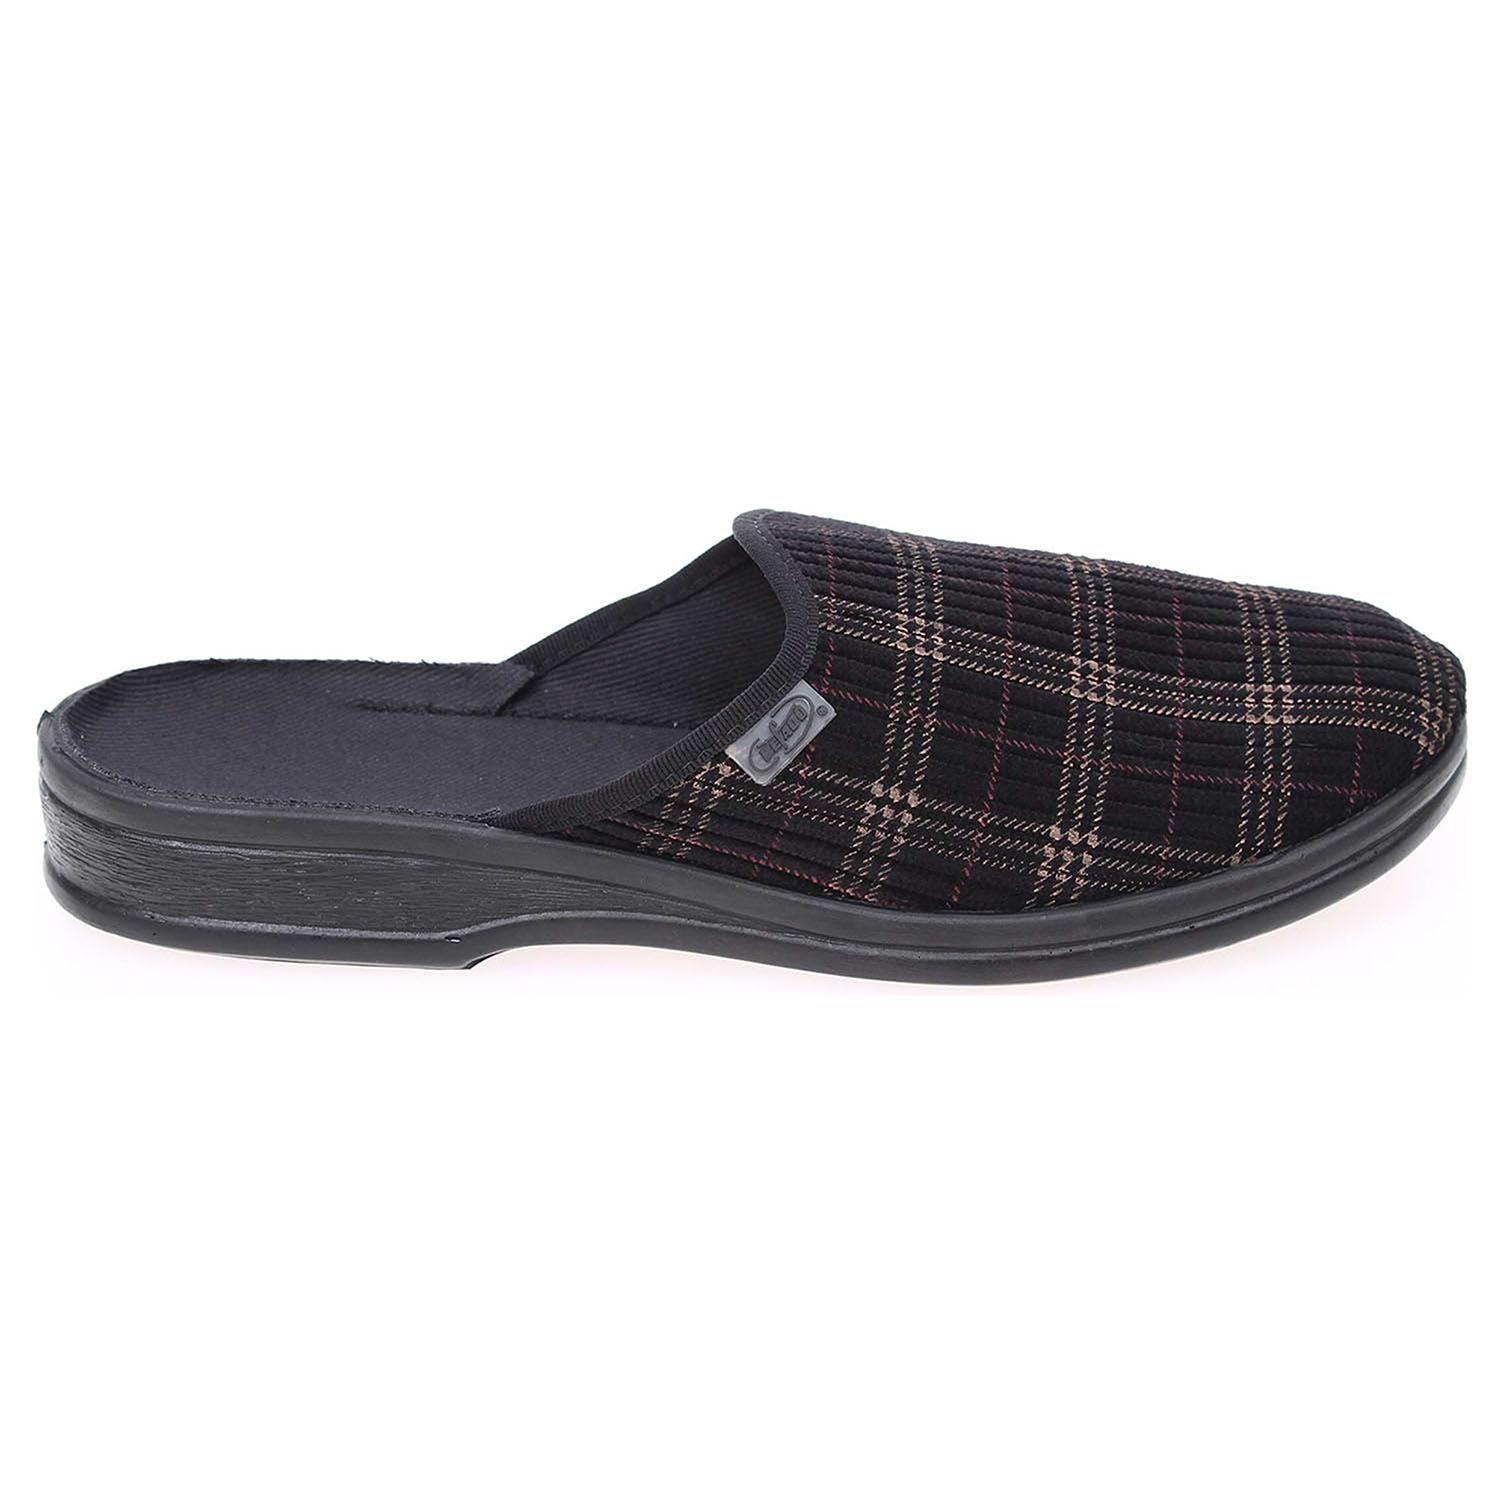 Ecco Befado domácí pantofle 089M303 hnědá 24800182